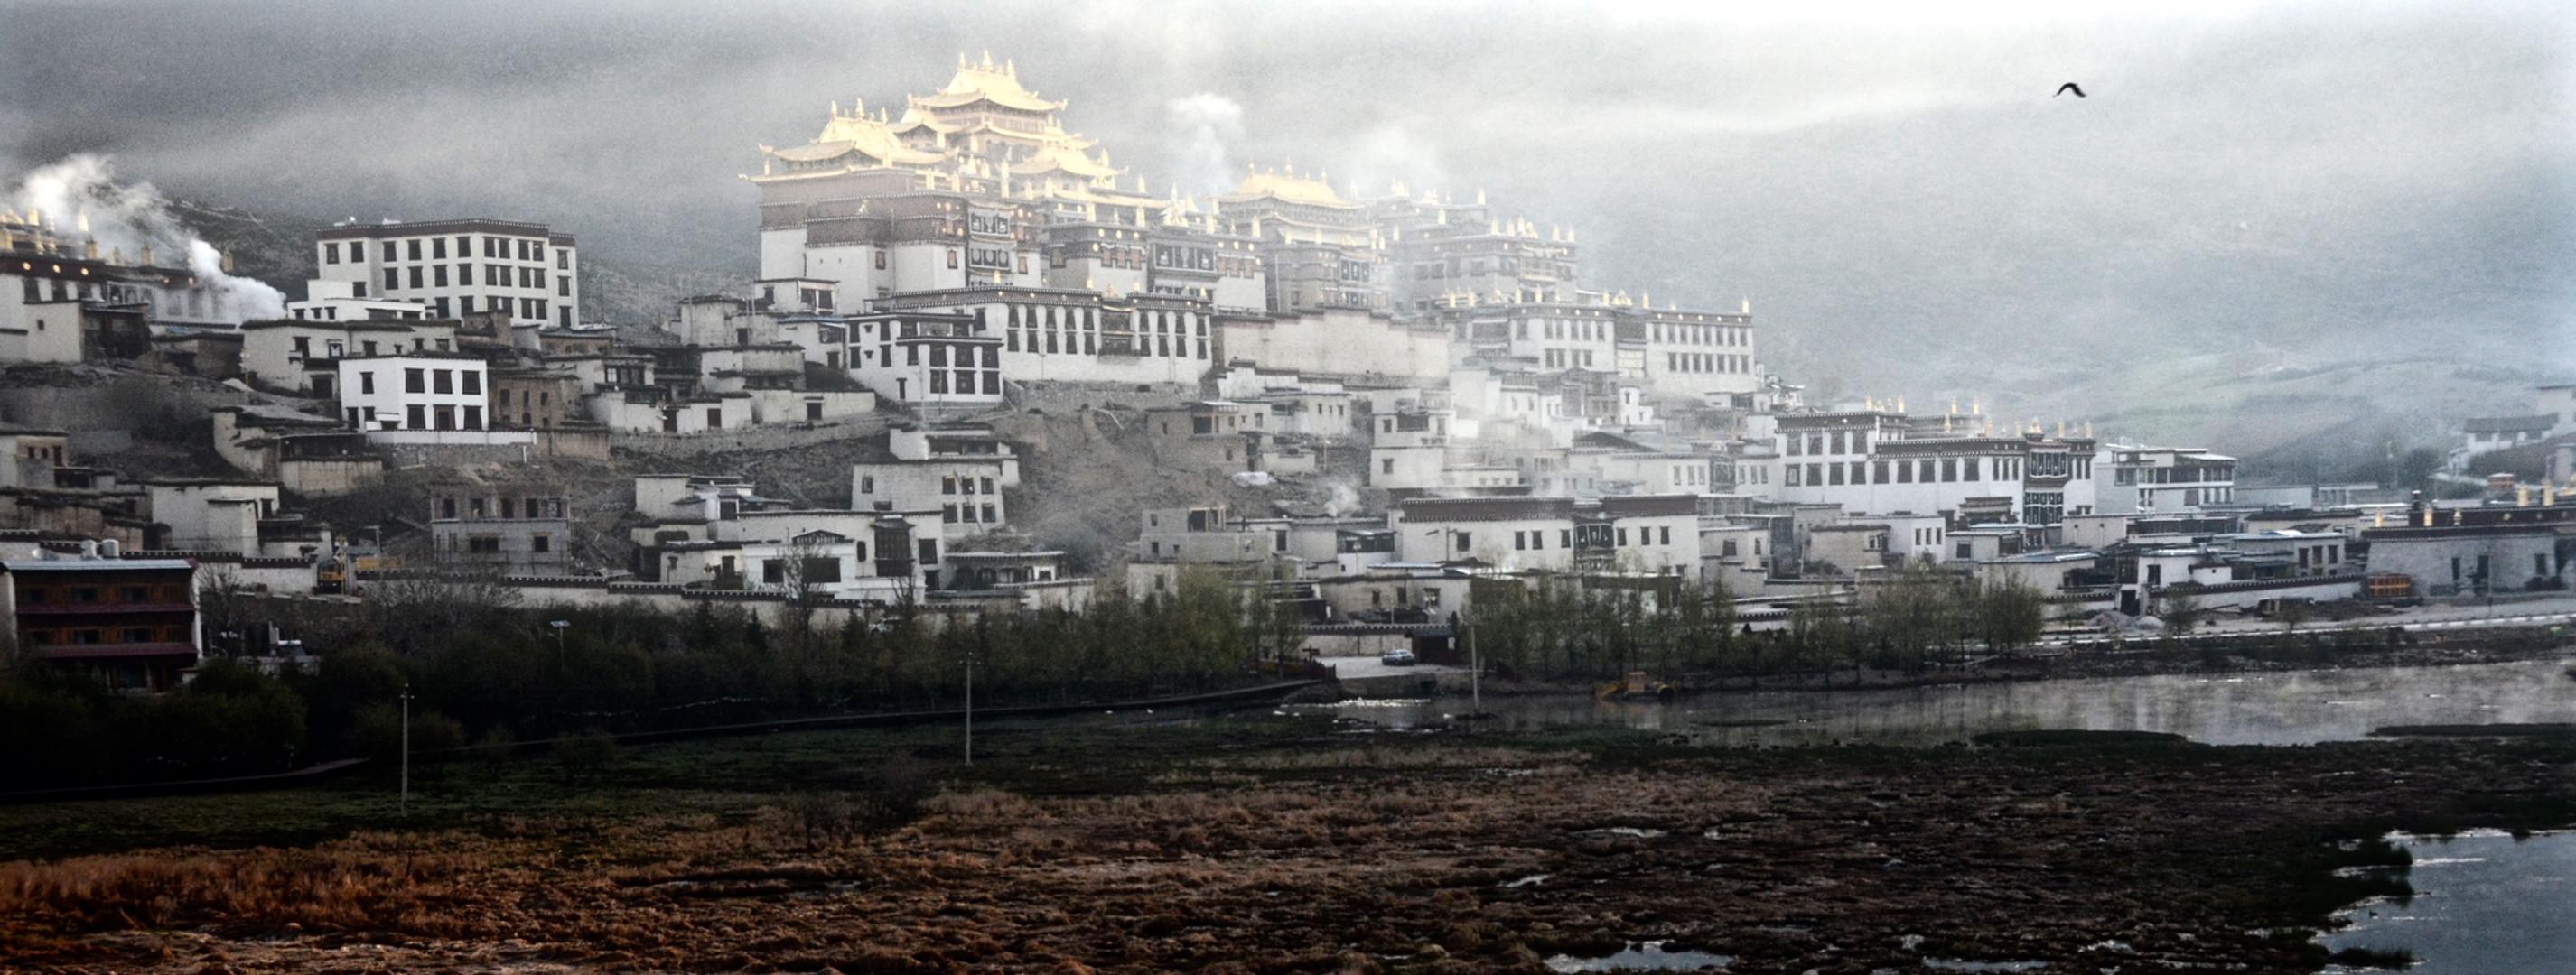 Songtsanling Monastery